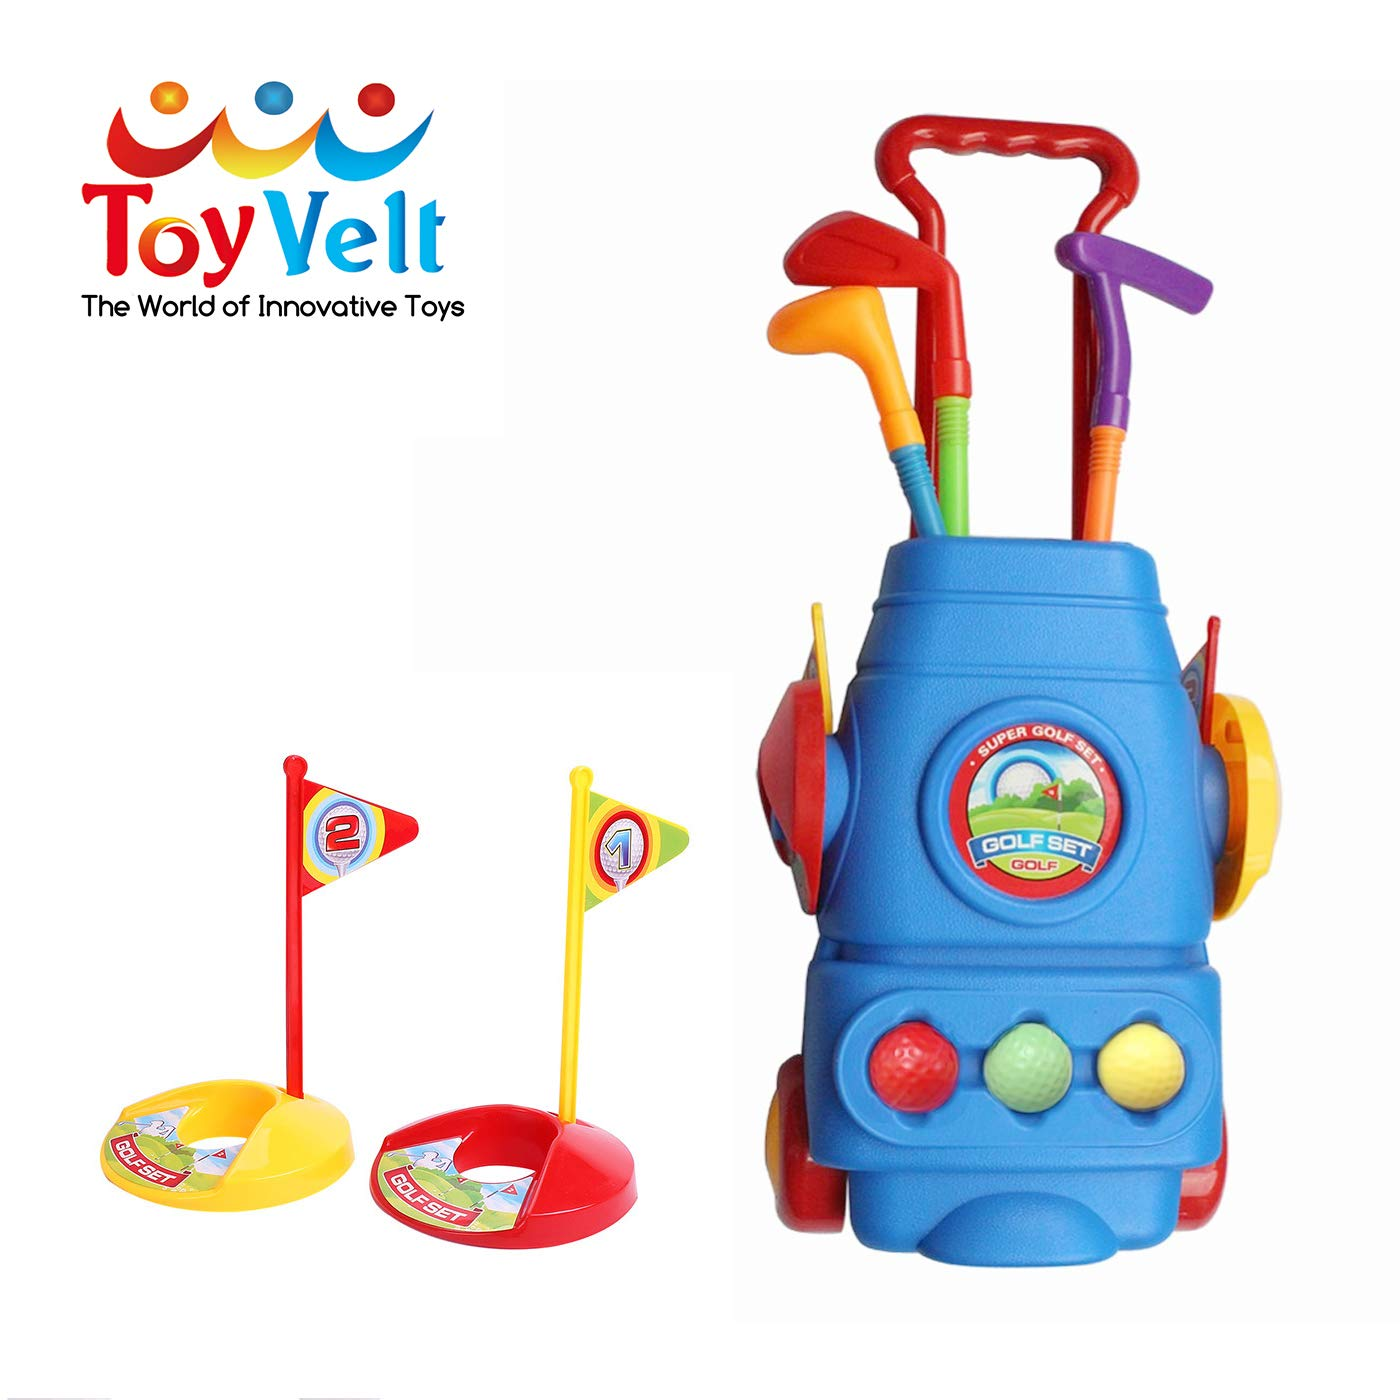 Amazon.com: ToyVelt Kids Golf Club Set - Carro de golf con ...